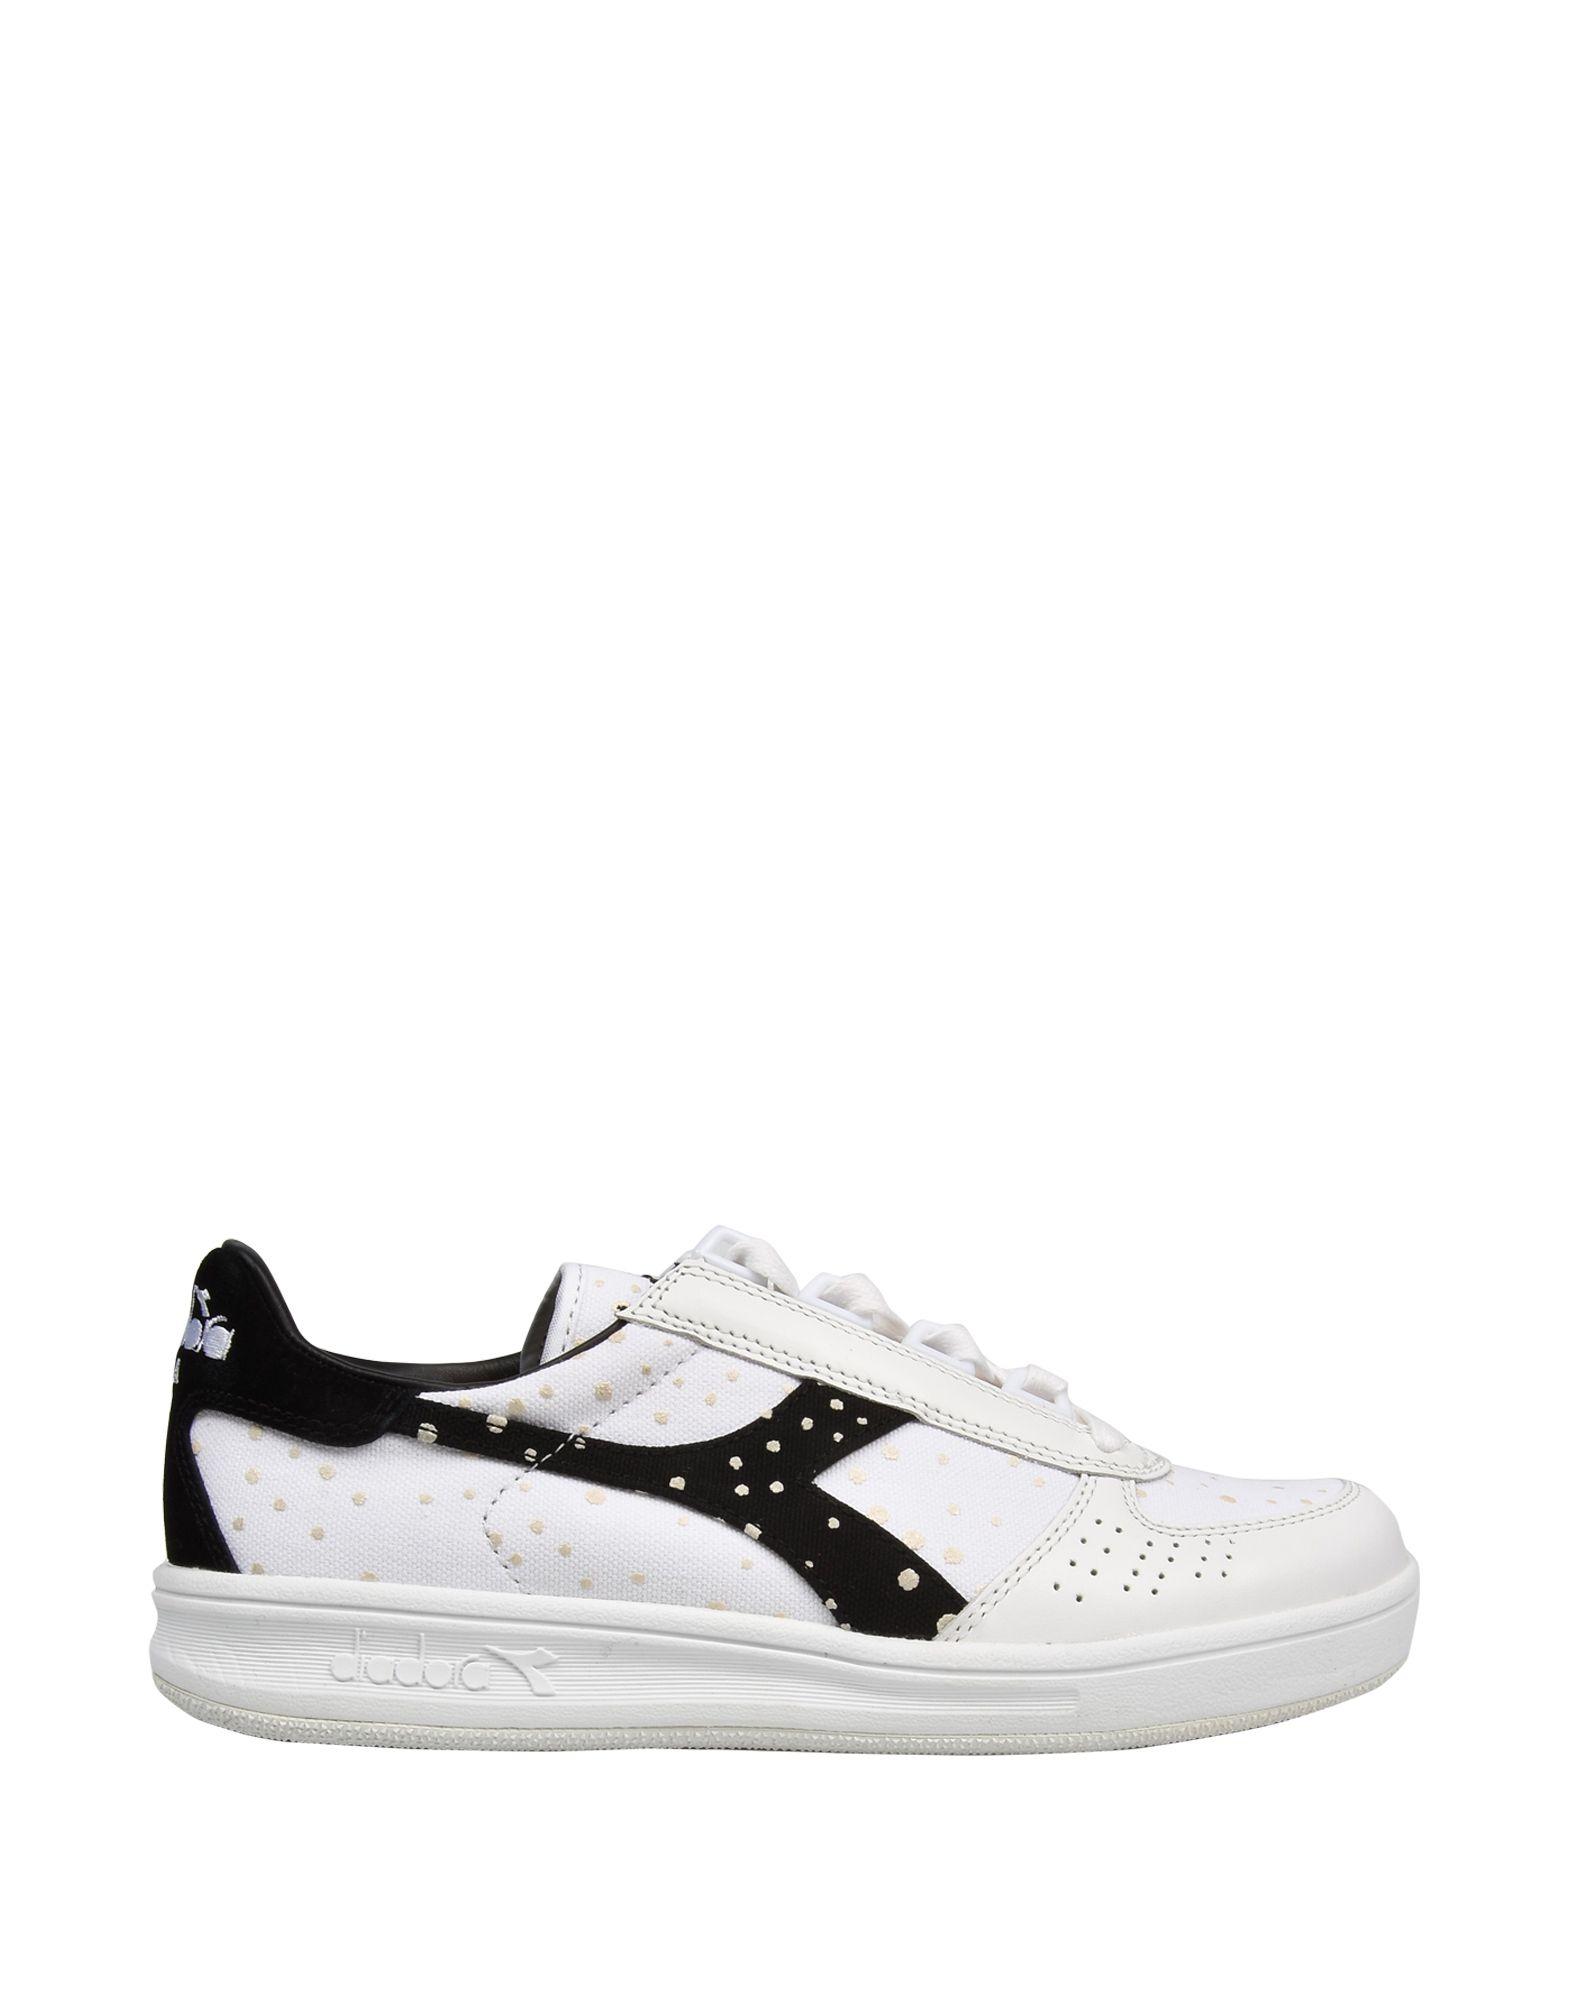 ... Sneakers Diadora Heritage B.Elite W Dots - Femme - Sneakers Diadora  Heritage sur ...